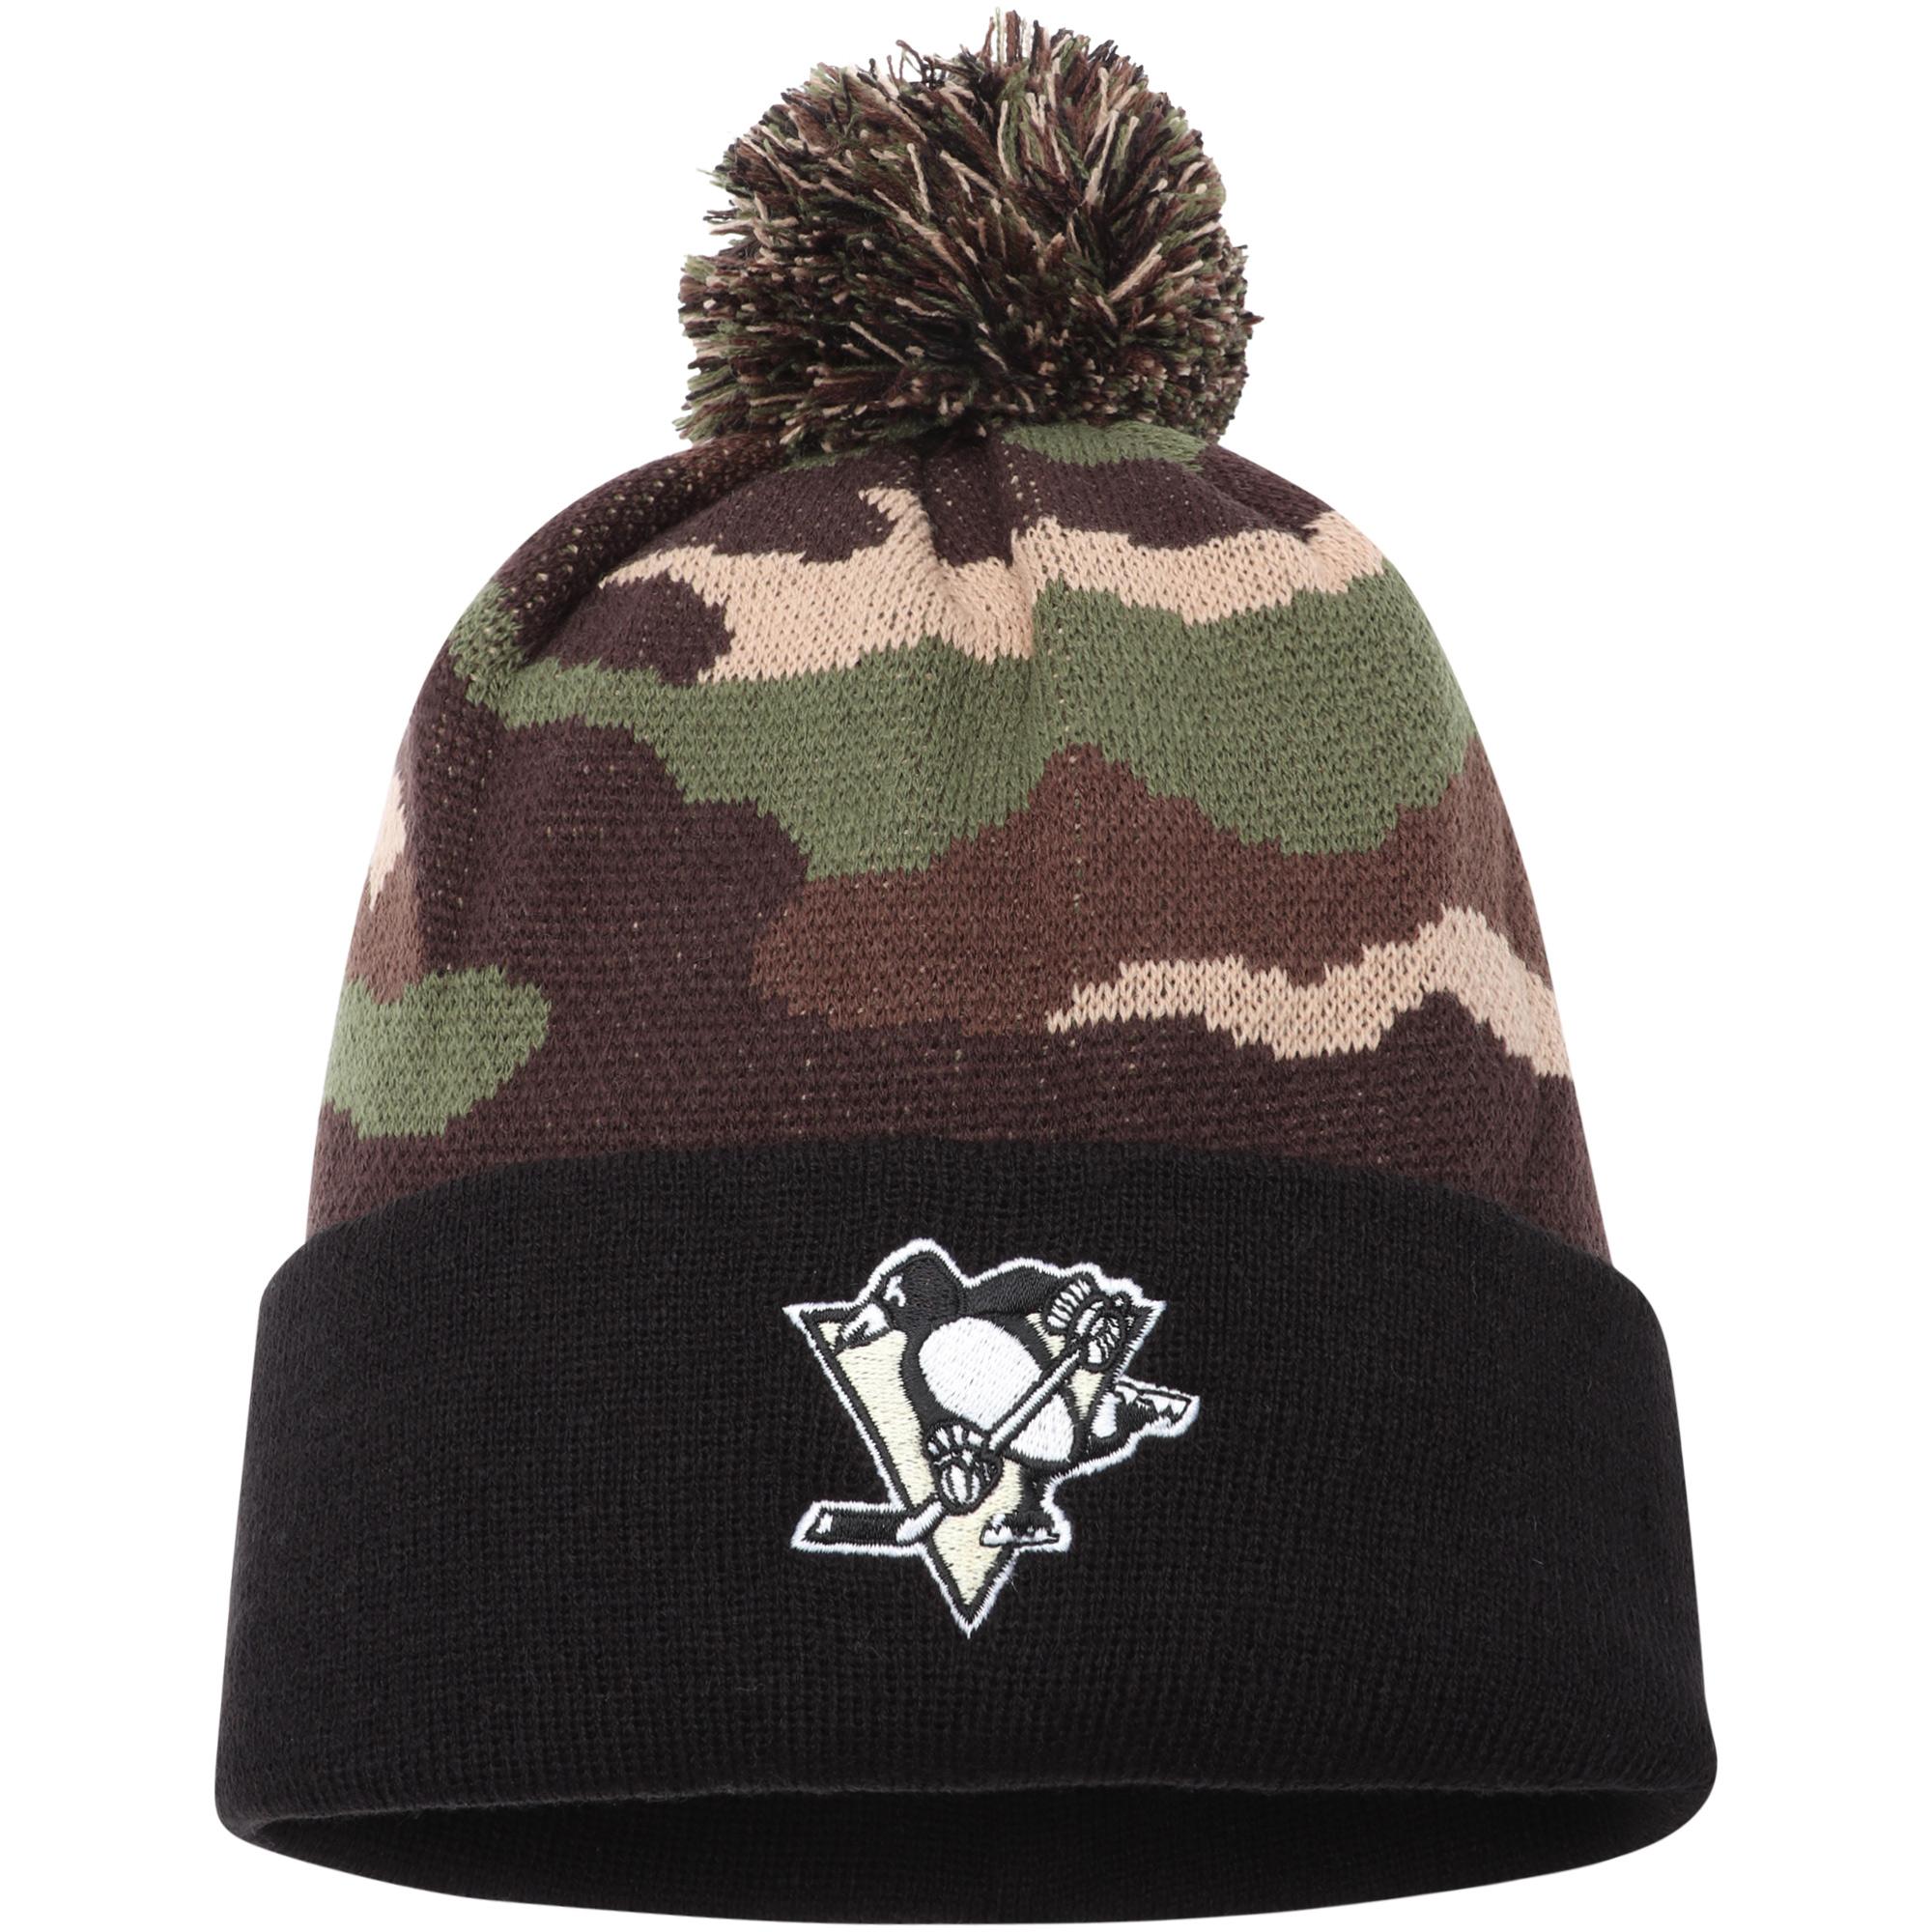 Pittsburgh Penguins American Needle Cuffed Pom Knit Hat - Camo - OSFA